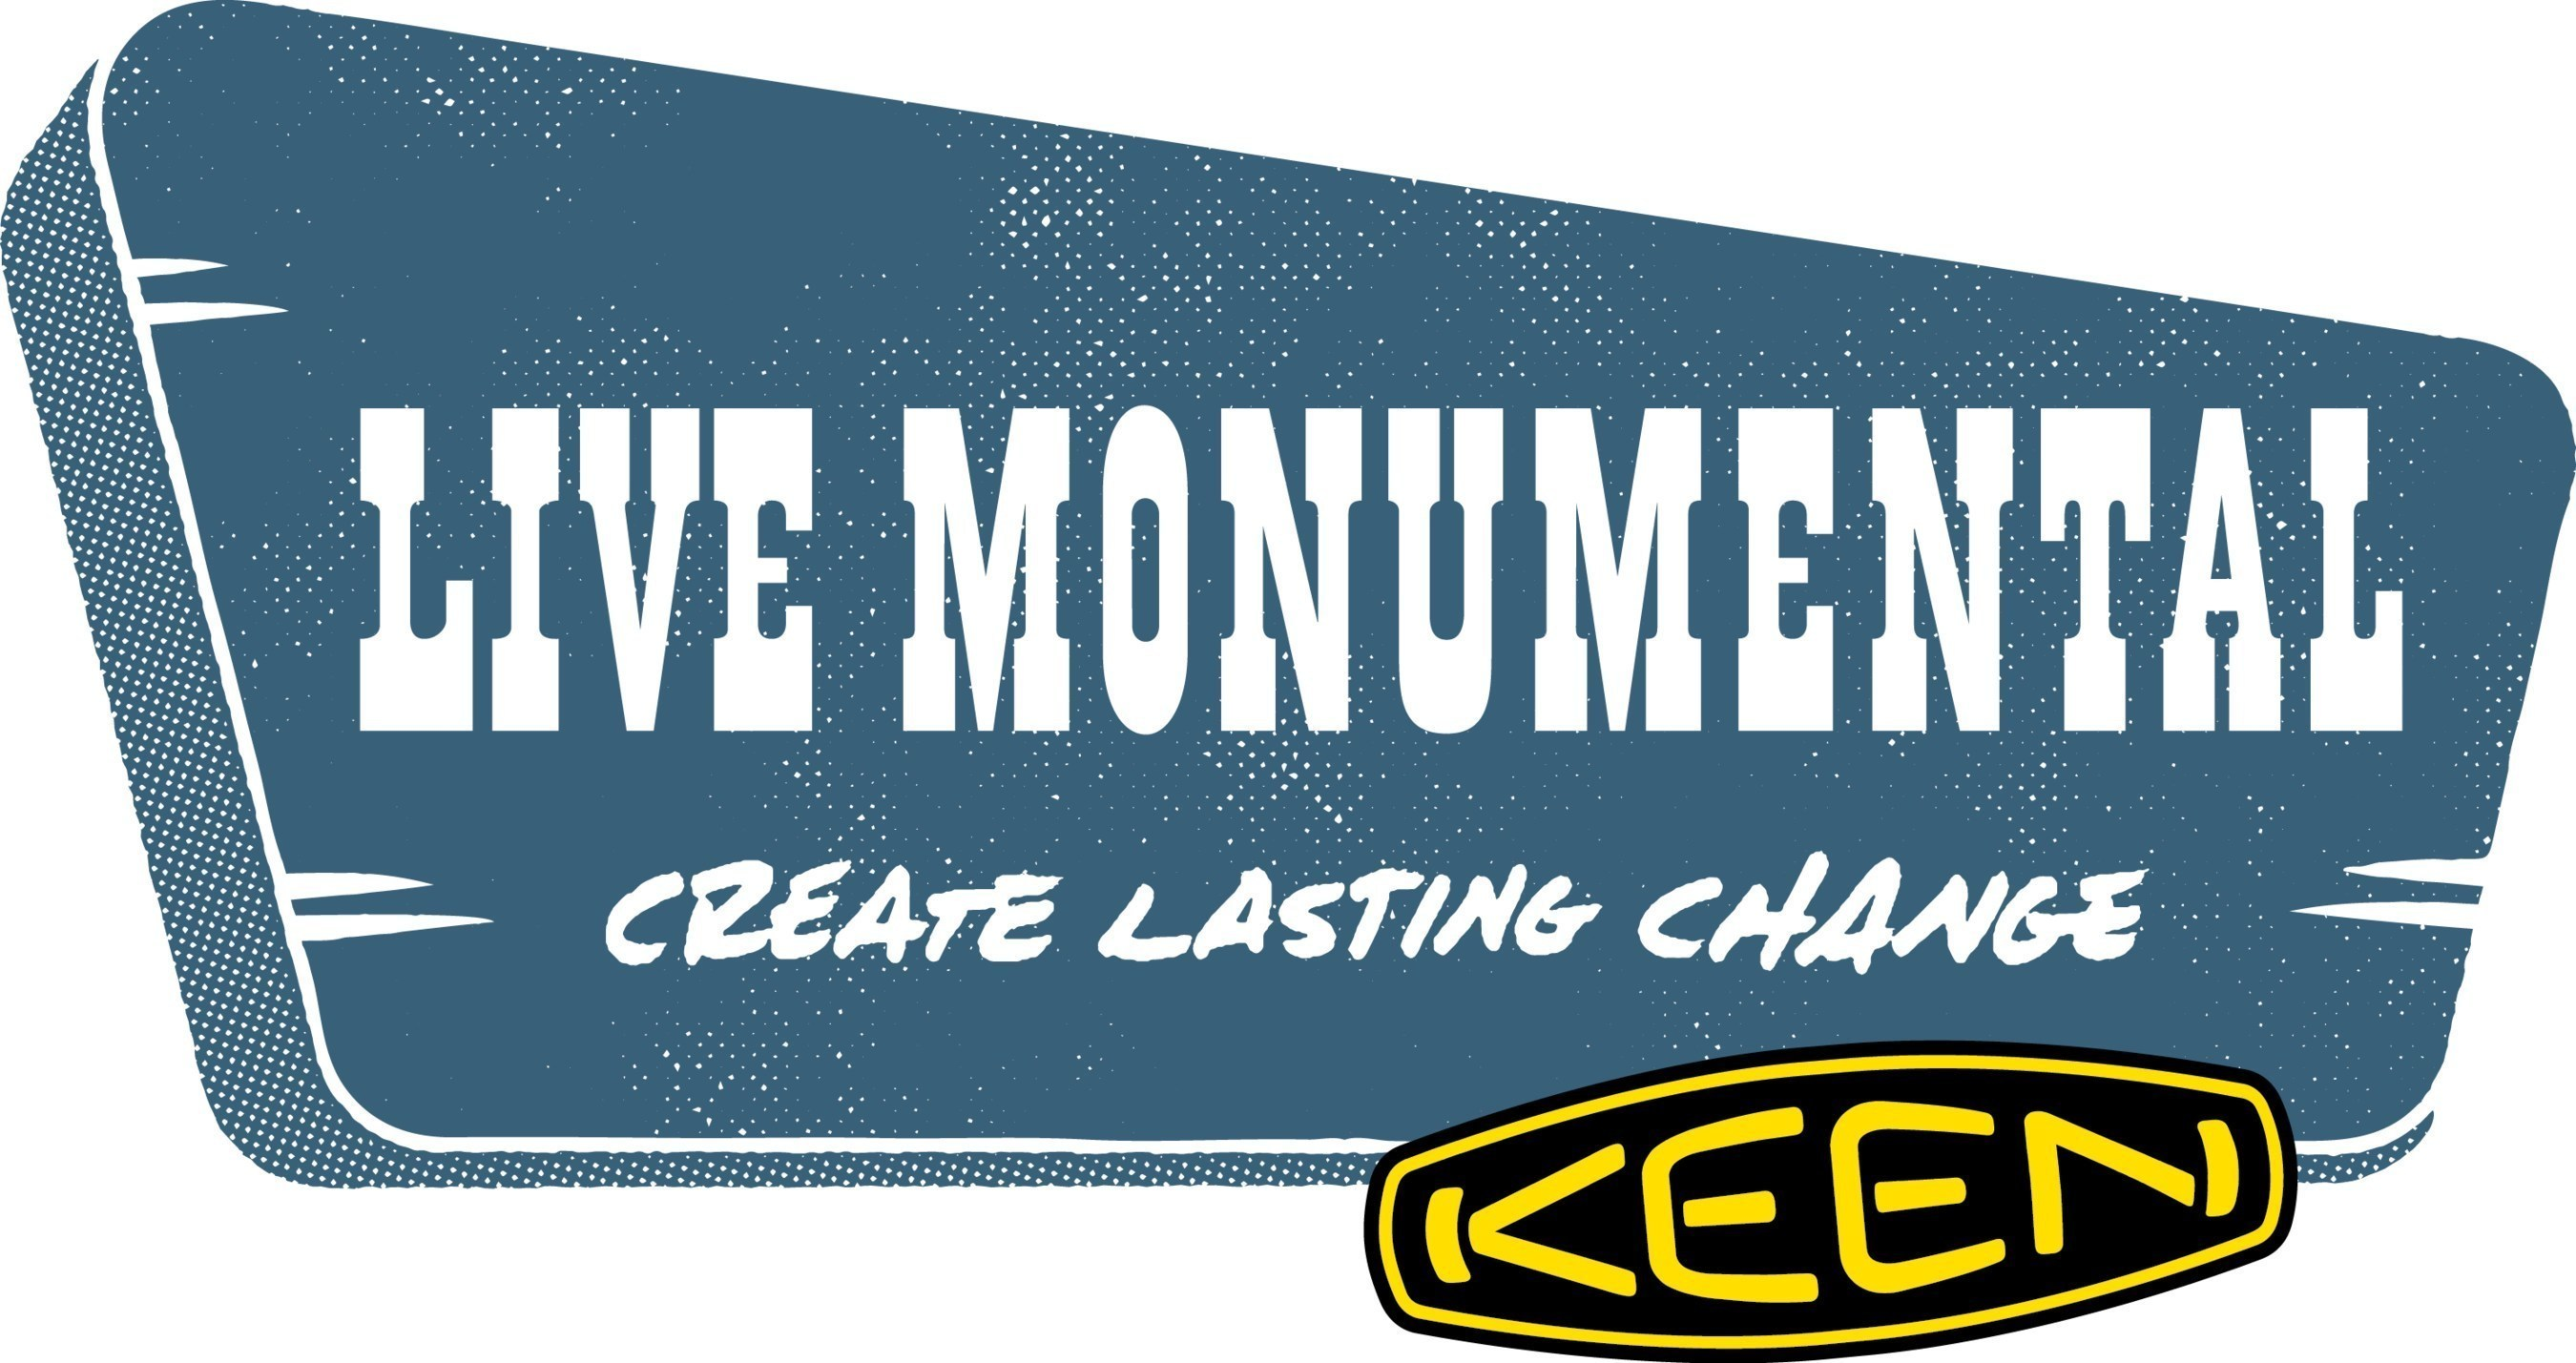 #LiveMonumental